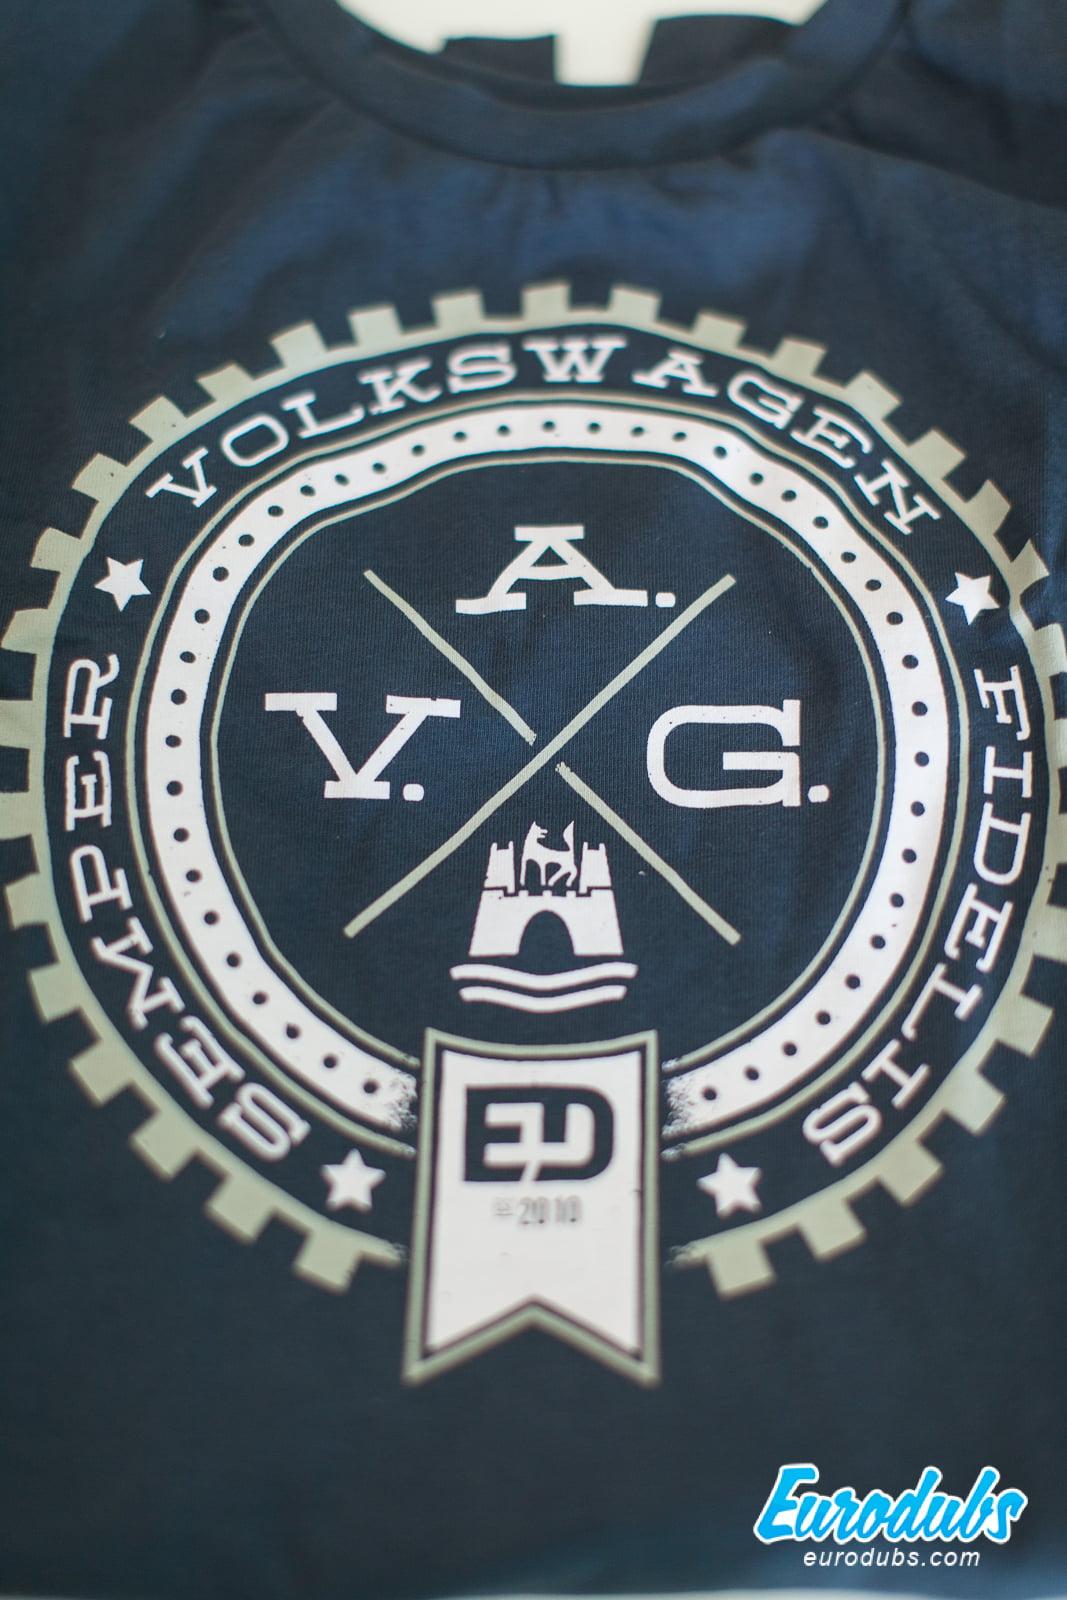 VAG t-shirt by Eurodubs